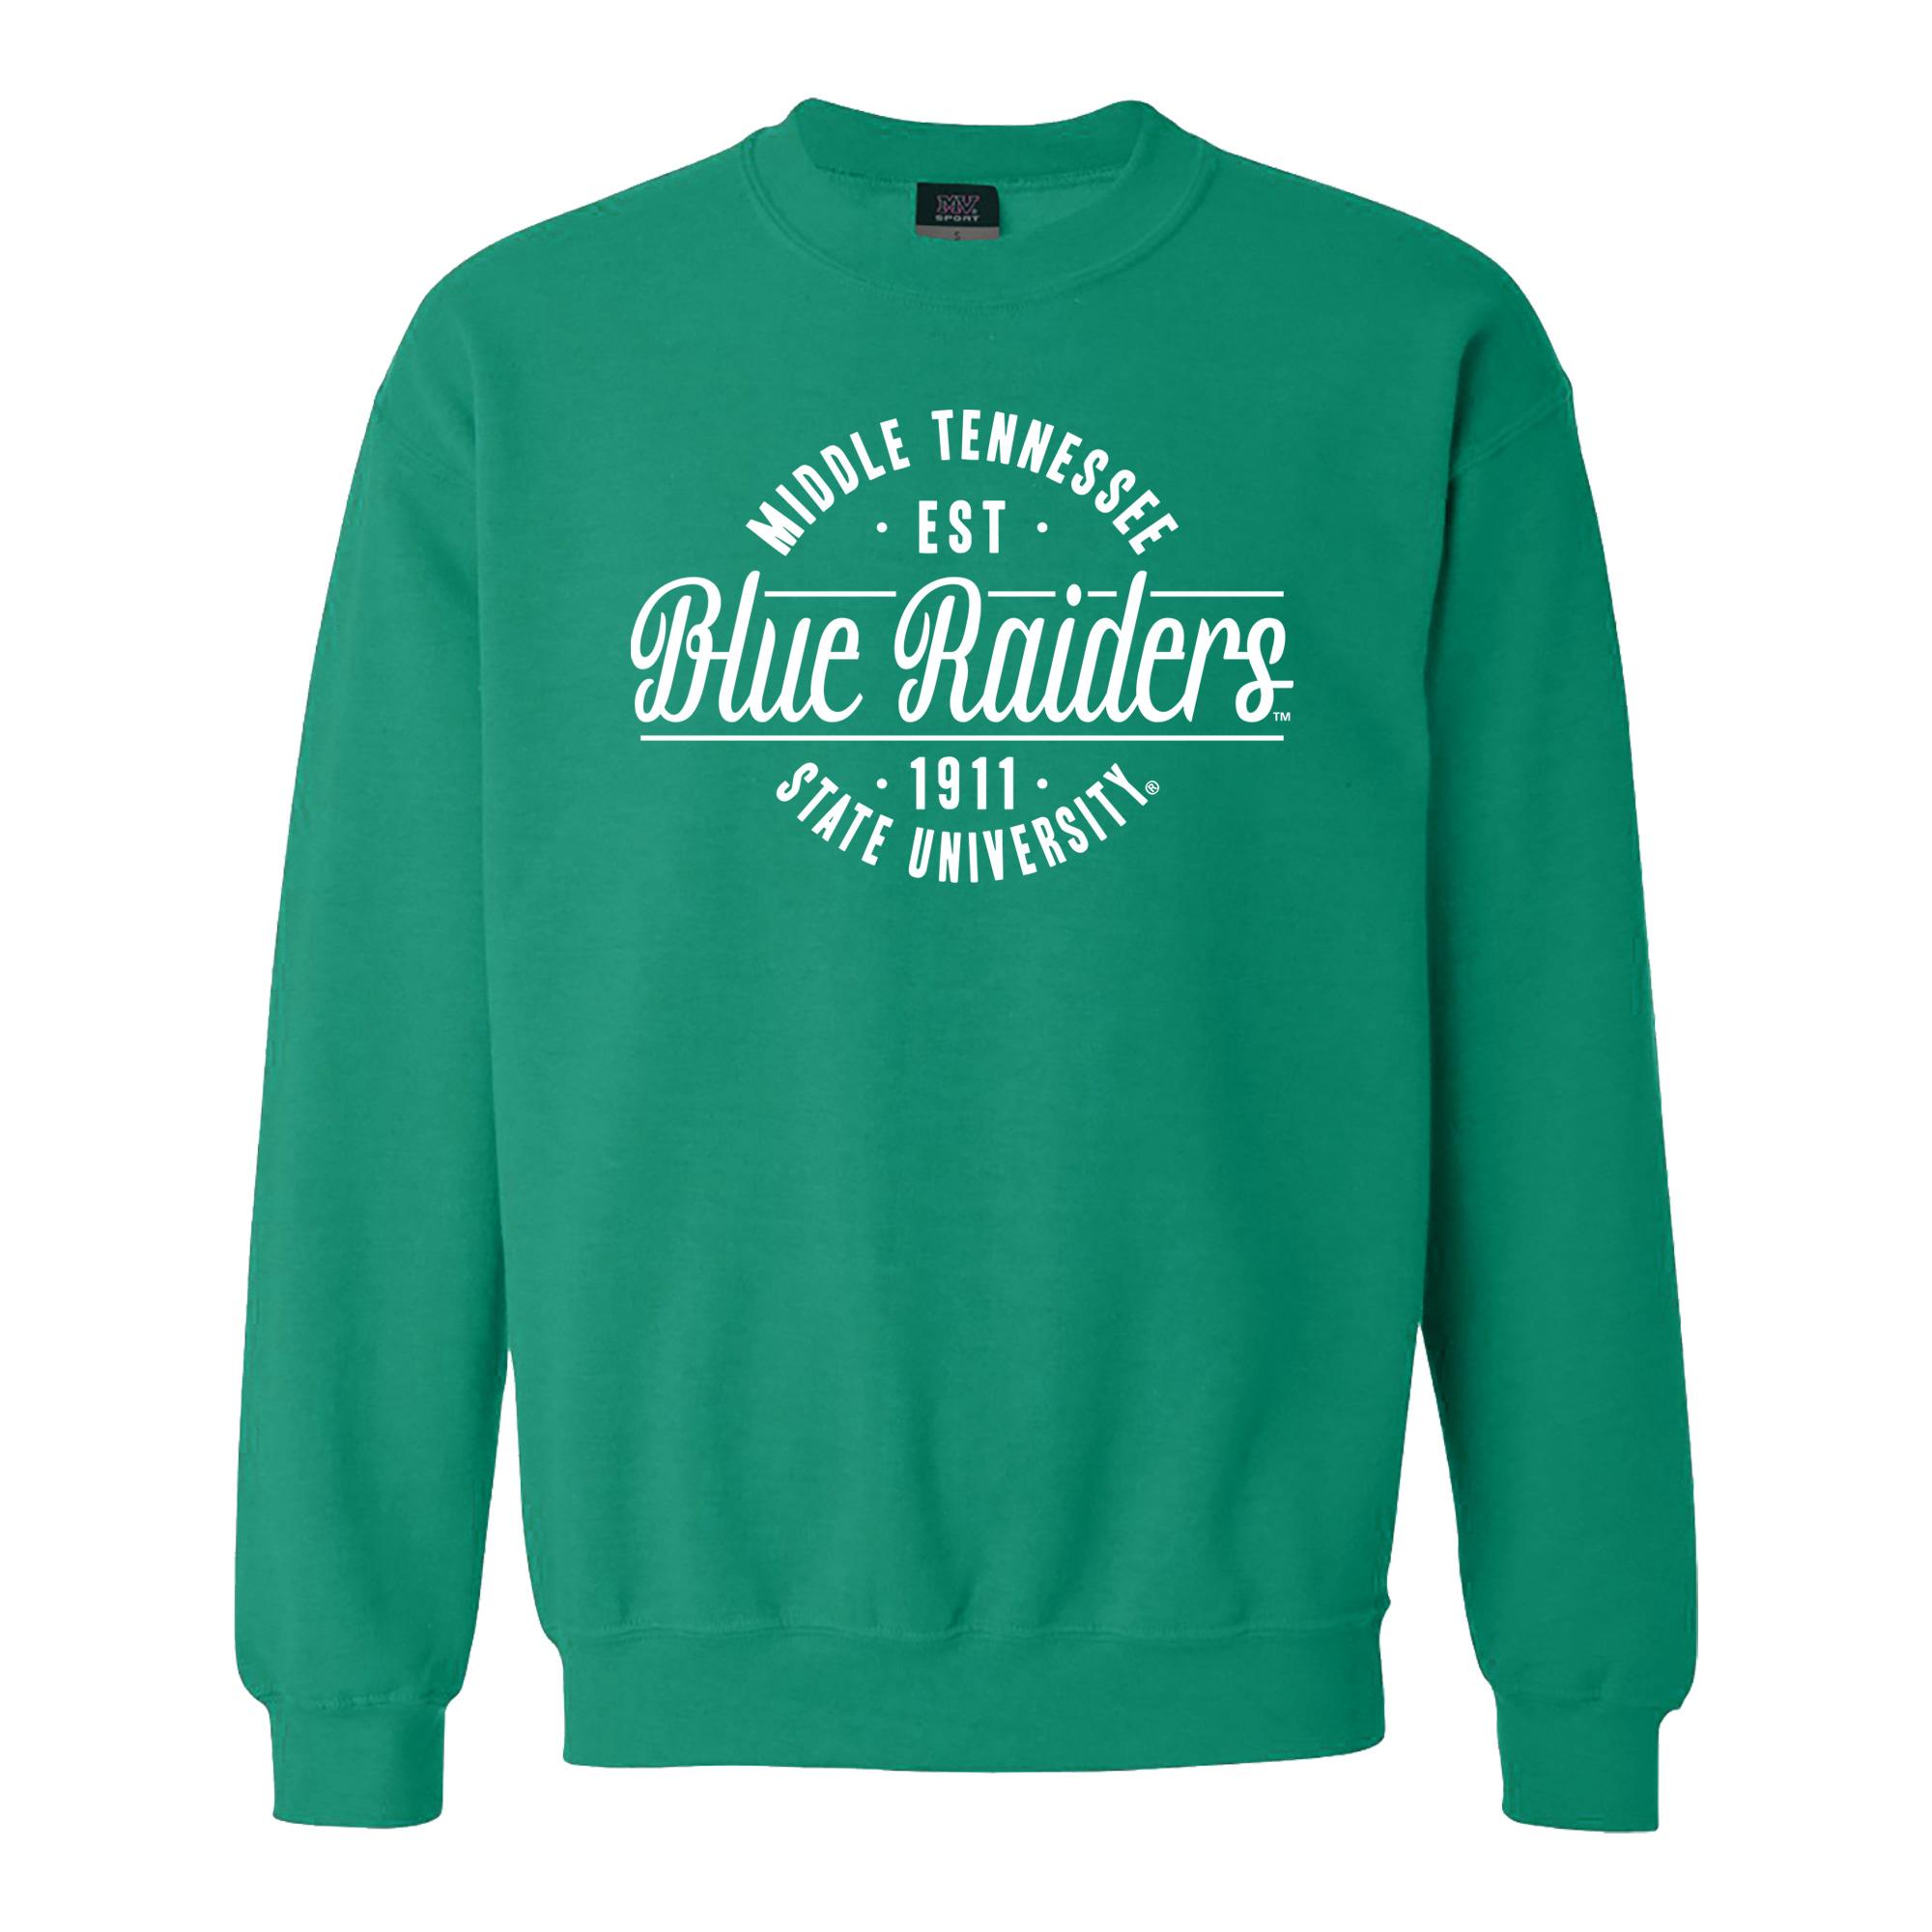 Middle Tennessee Blue Raiders Est. 1911 Comfort Fleece Sweatshirt